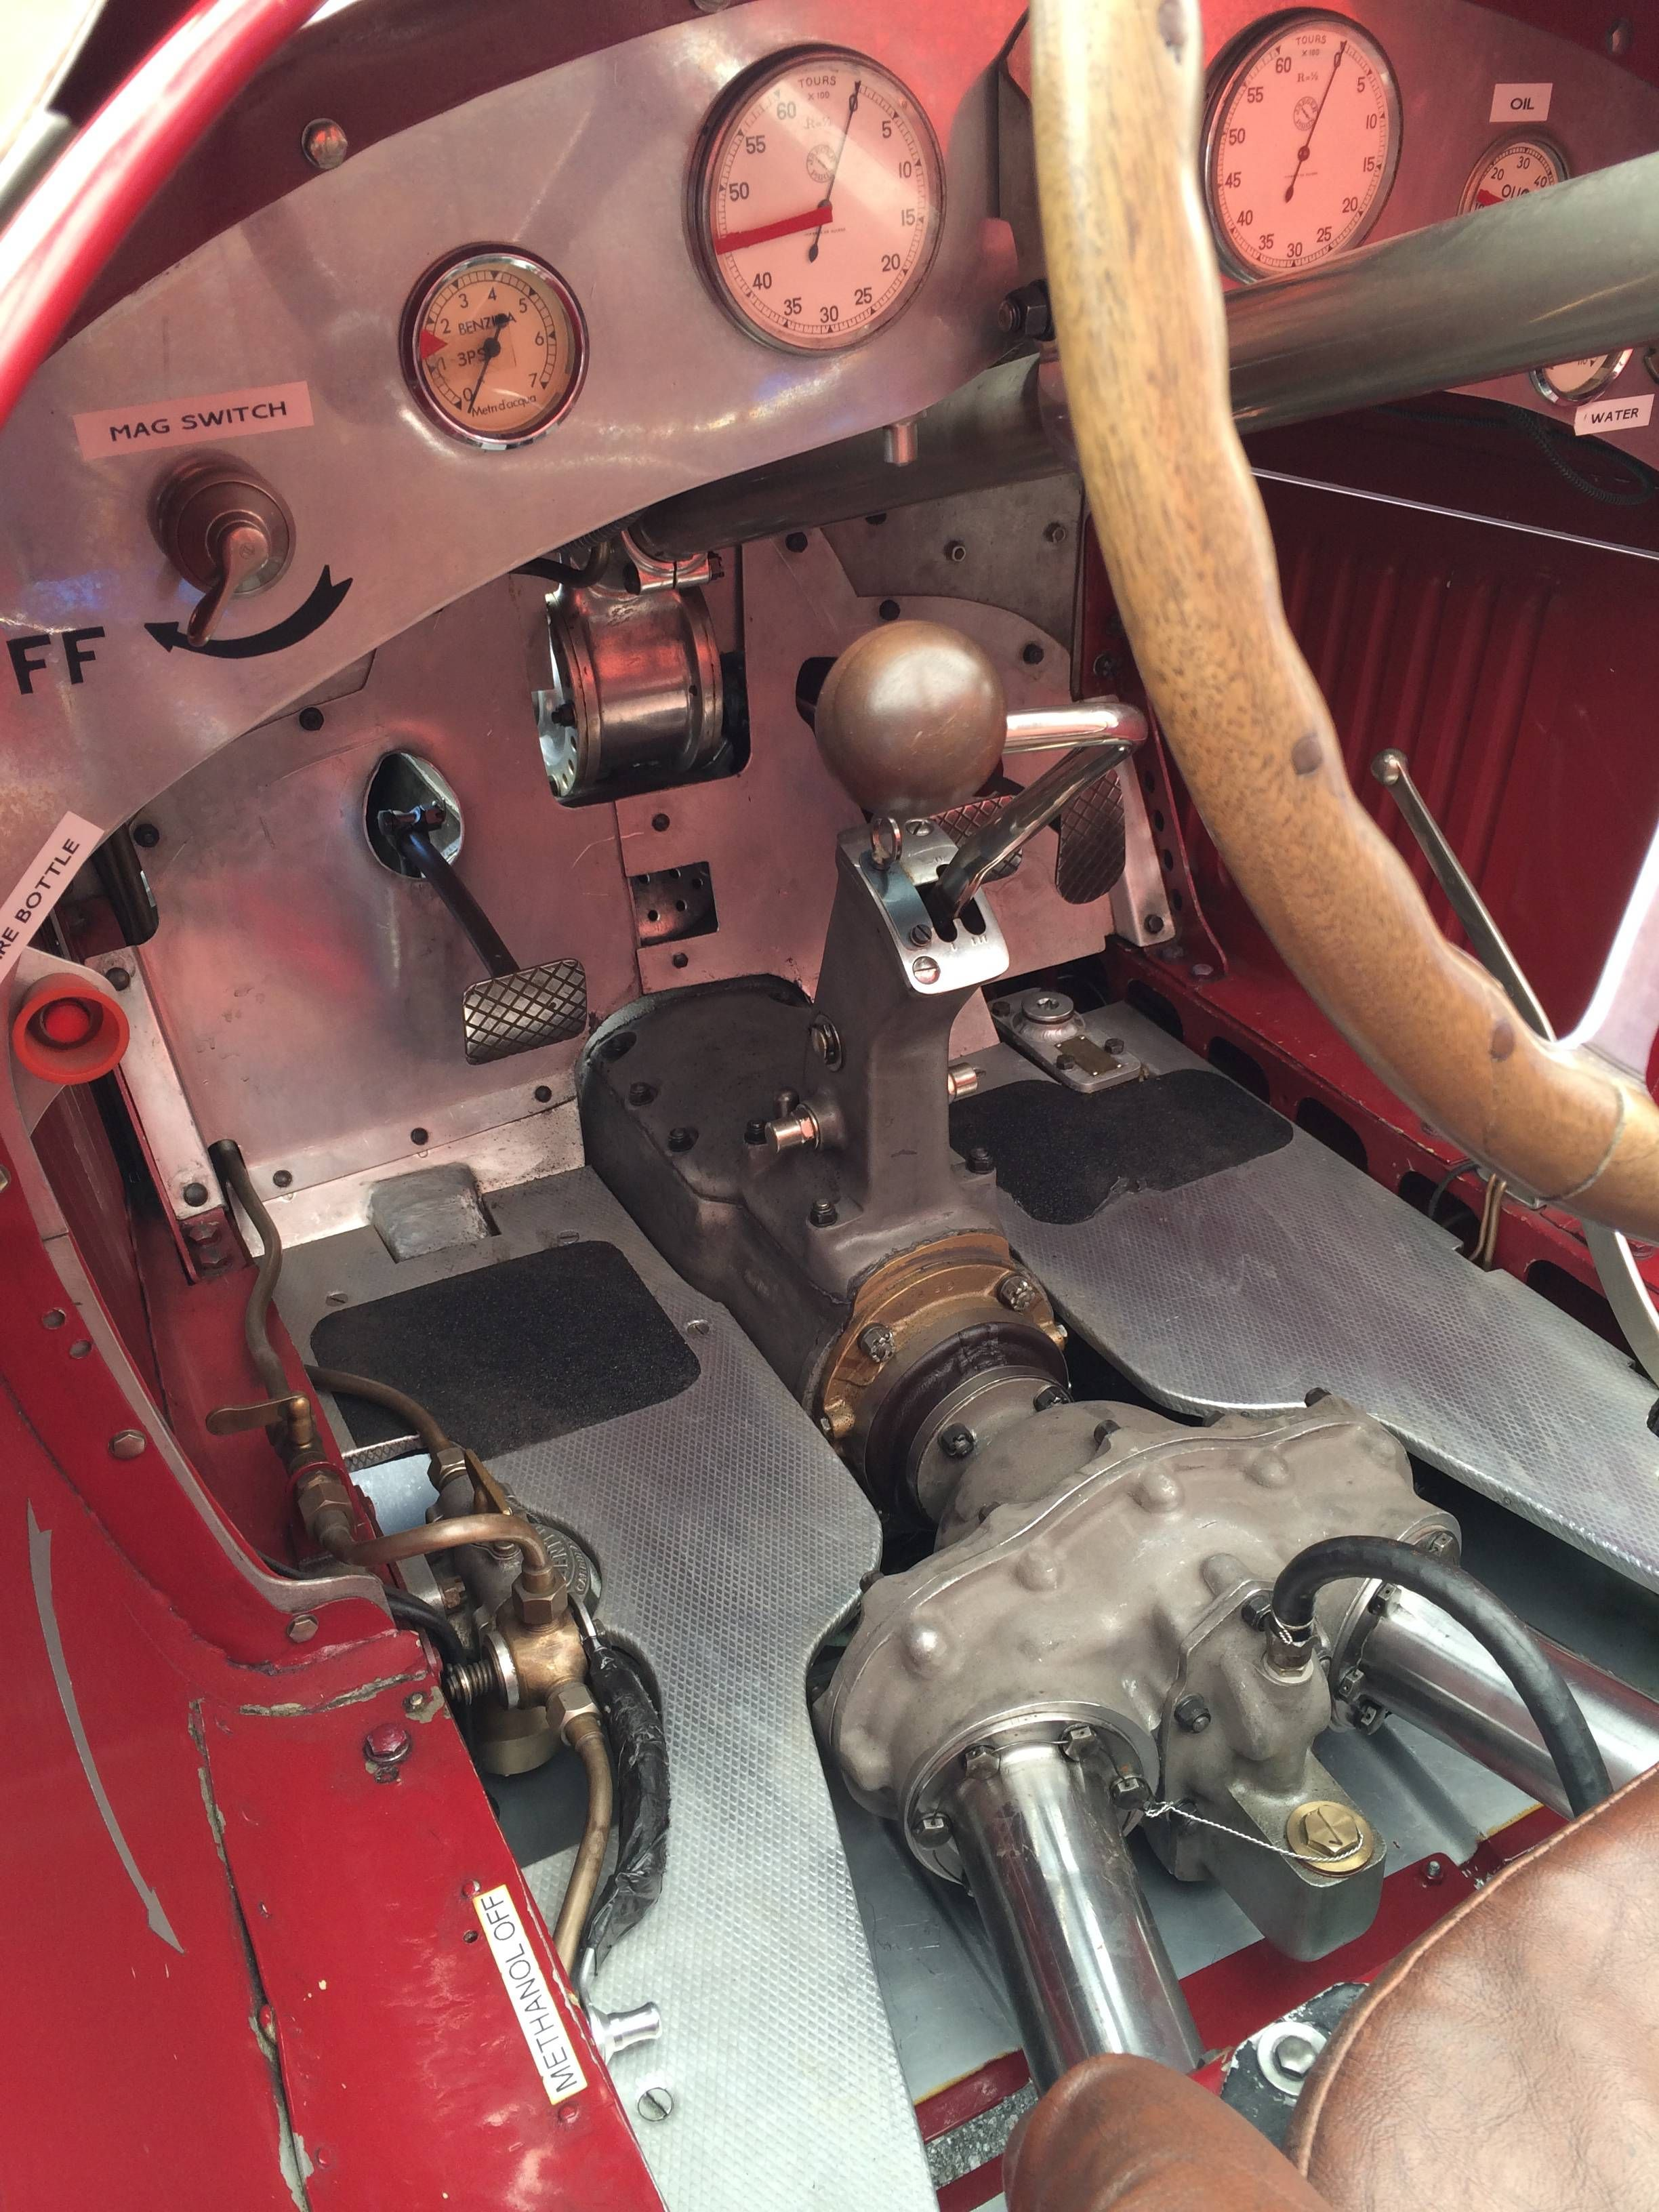 Cockpit detail of a 1934 Alfa Romeo Tipo B (P3) Raced by Scuderia Ferrari [OC][2448x3264]